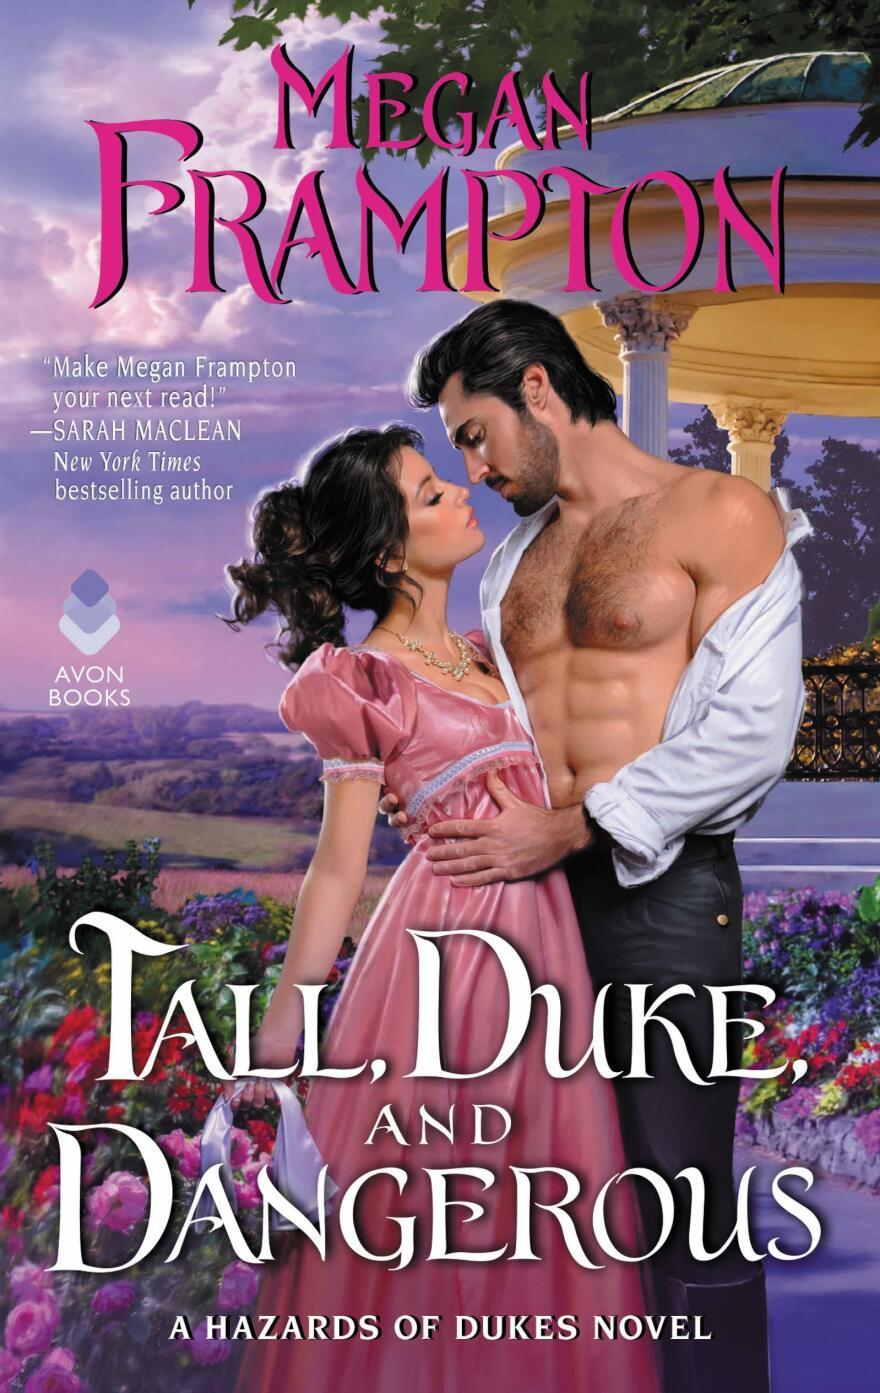 Tall, Duke and Dangerous, by Megan Frampton